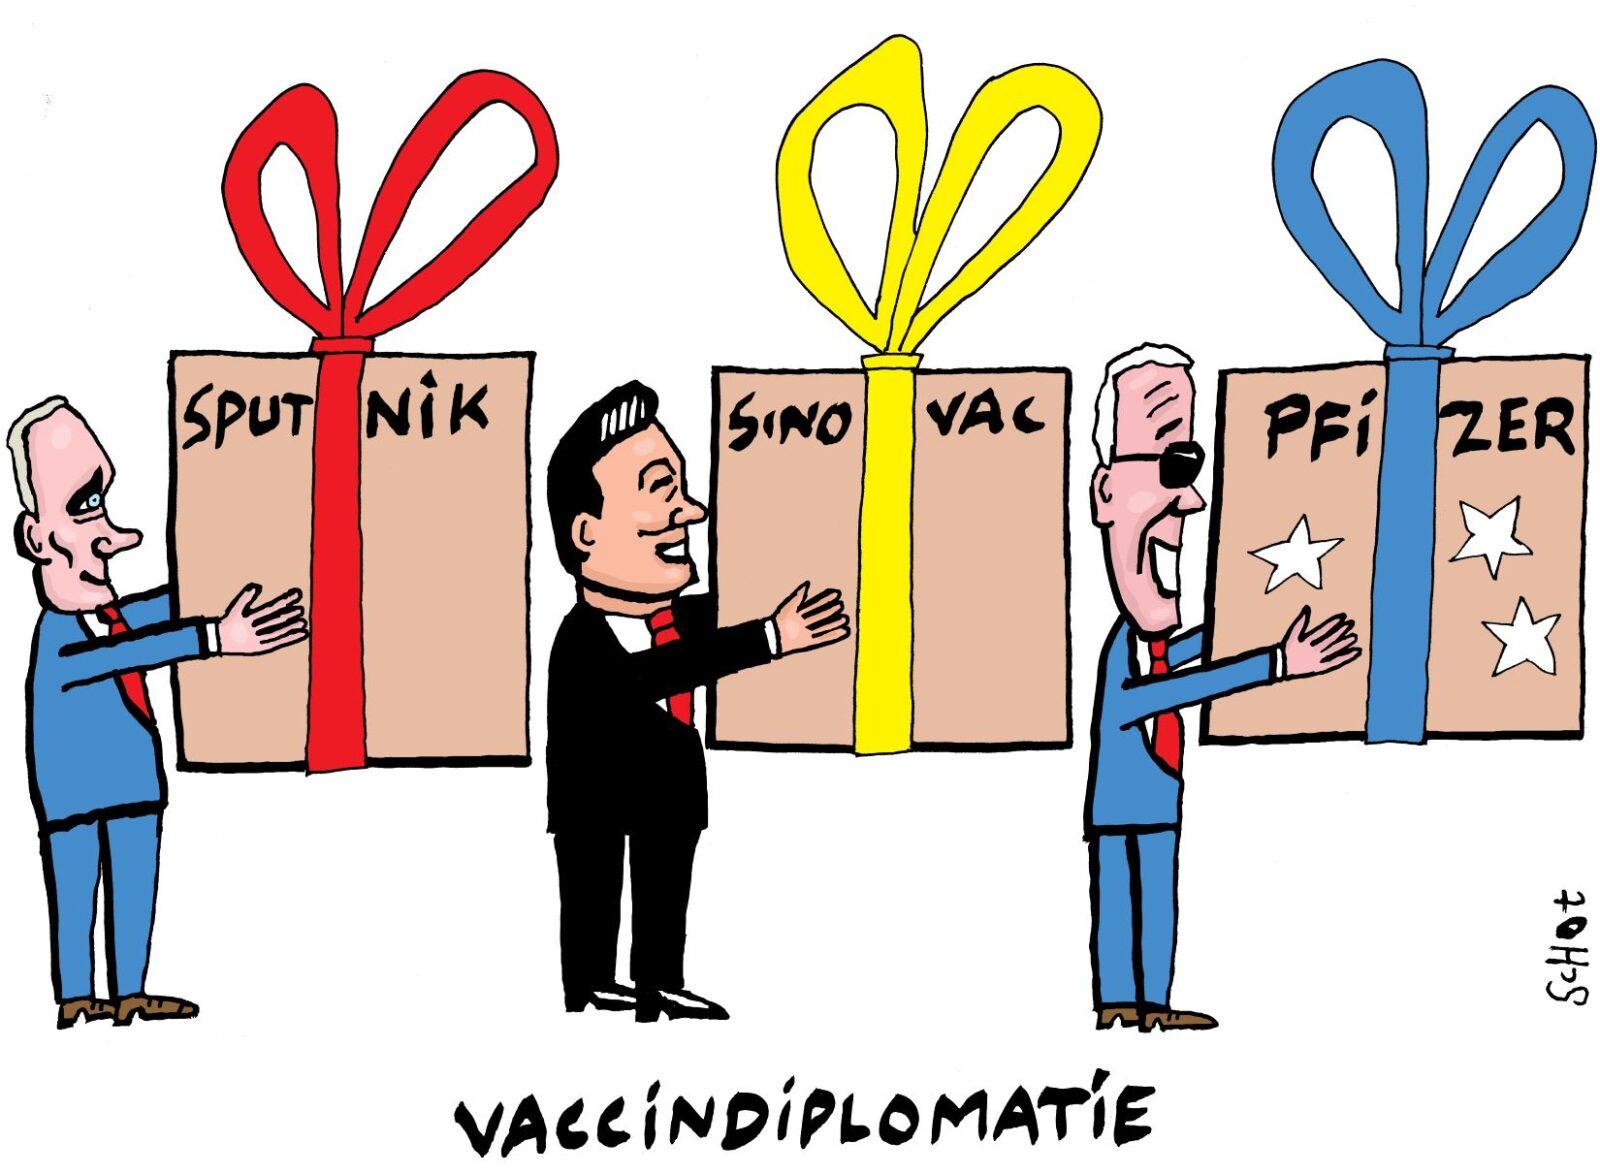 em-vaccindiplomatie-def